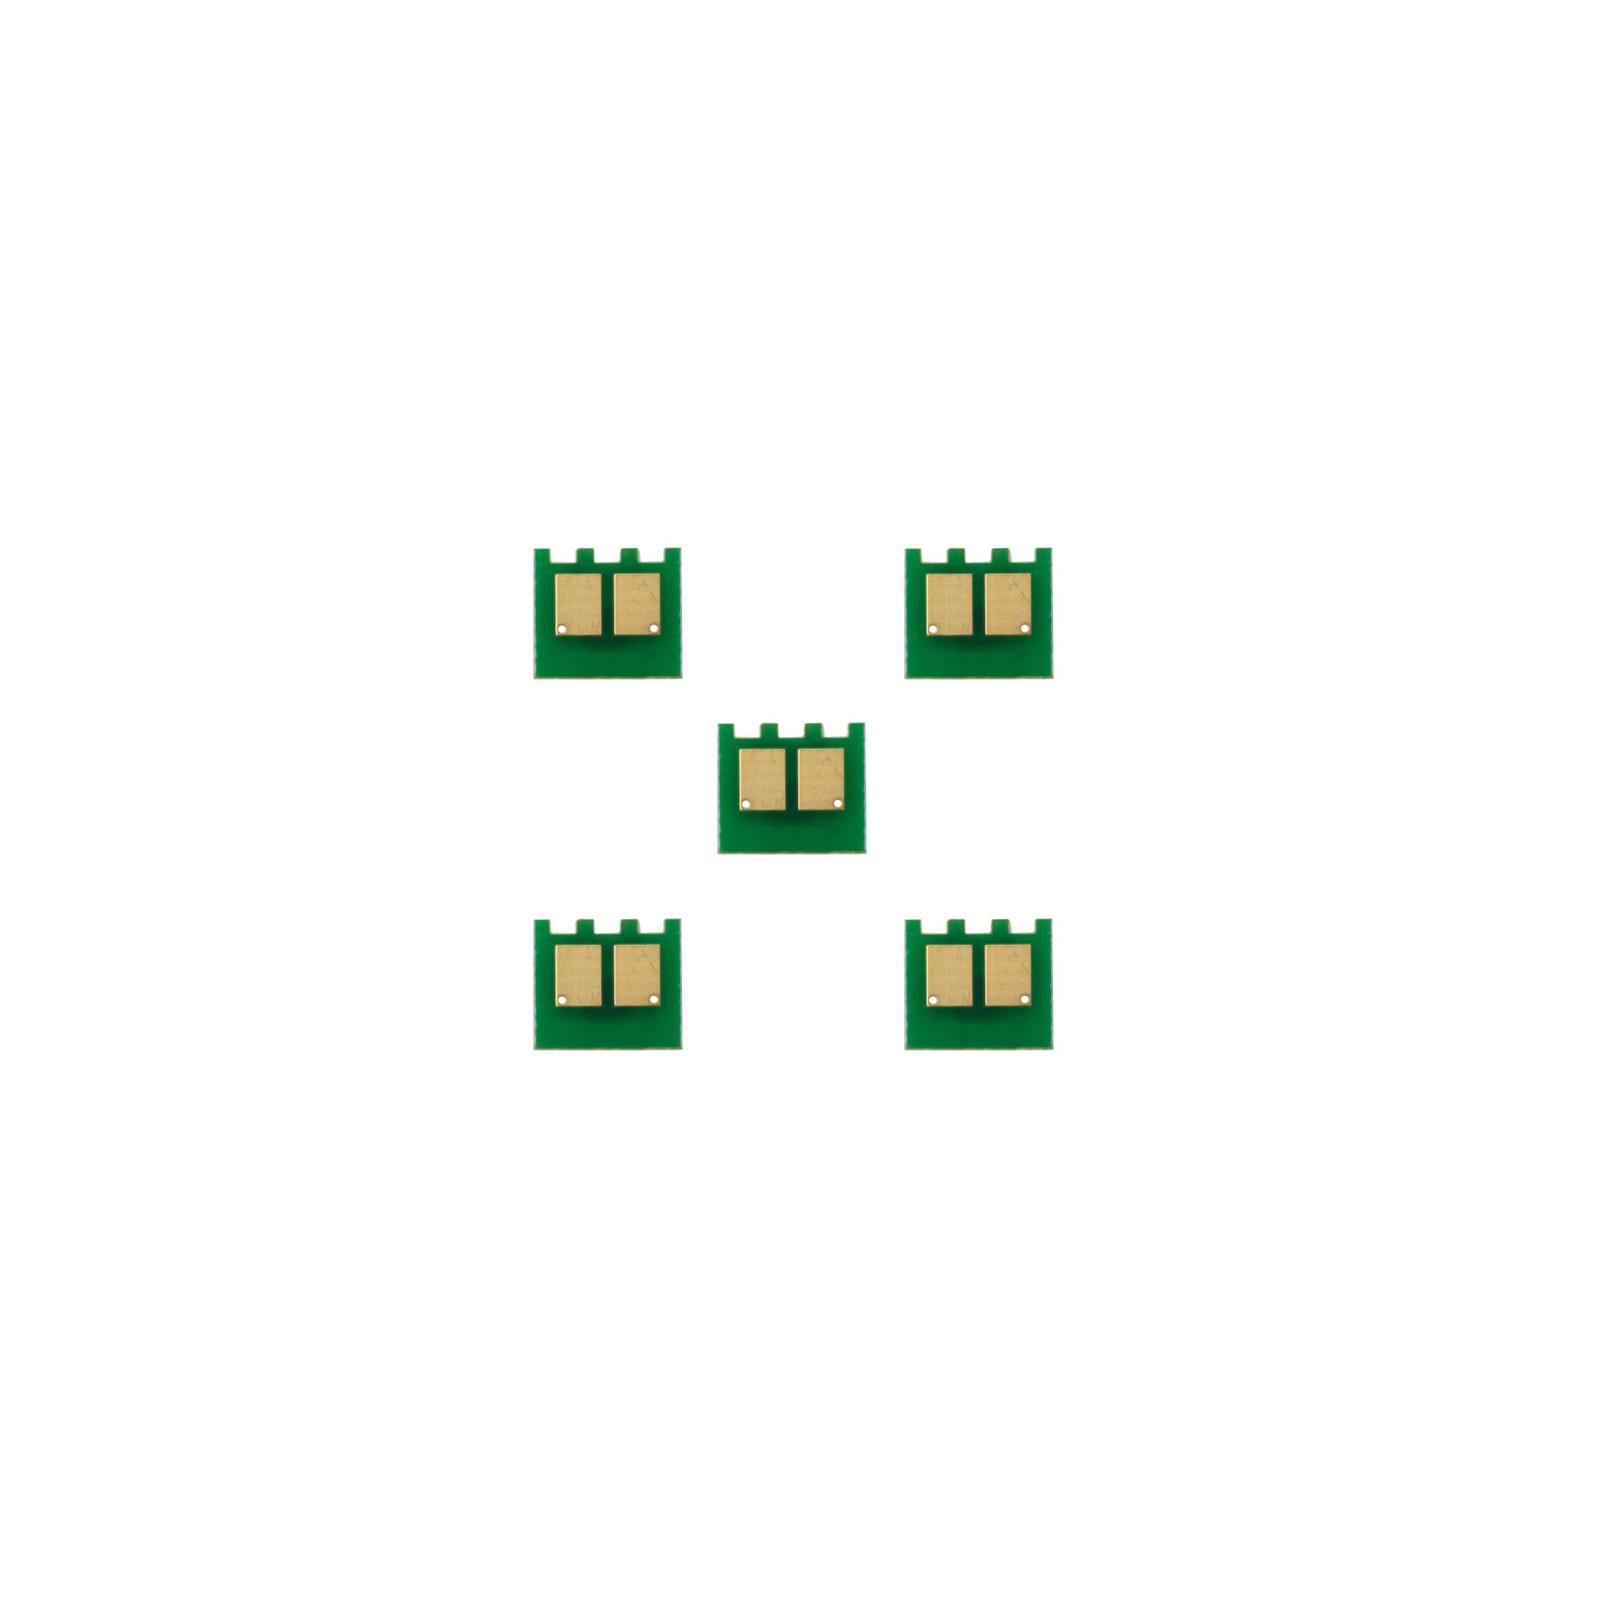 Чип для картриджа HP CLJ Pro M476 (MPS) (CF380X) 5k black Static Control (XTH476CP-HYK)